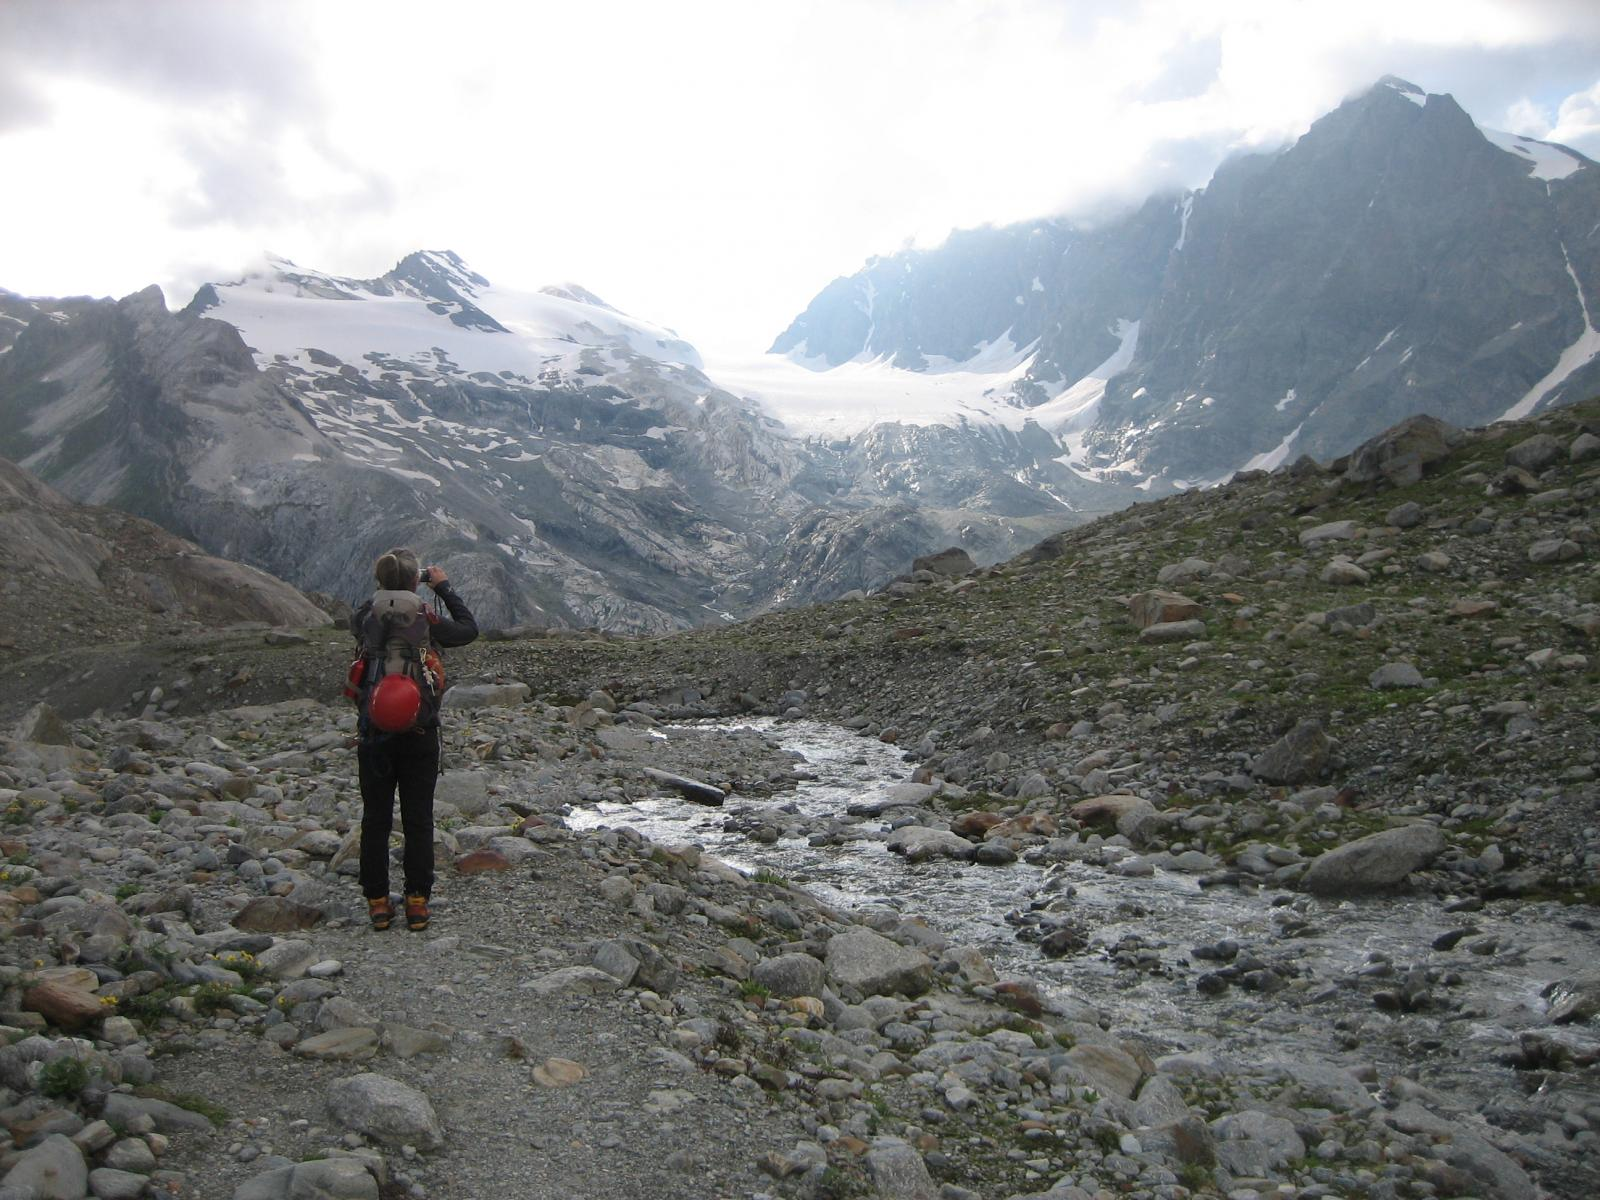 Ultimi sguardi sui ghiacciai del Bernina.